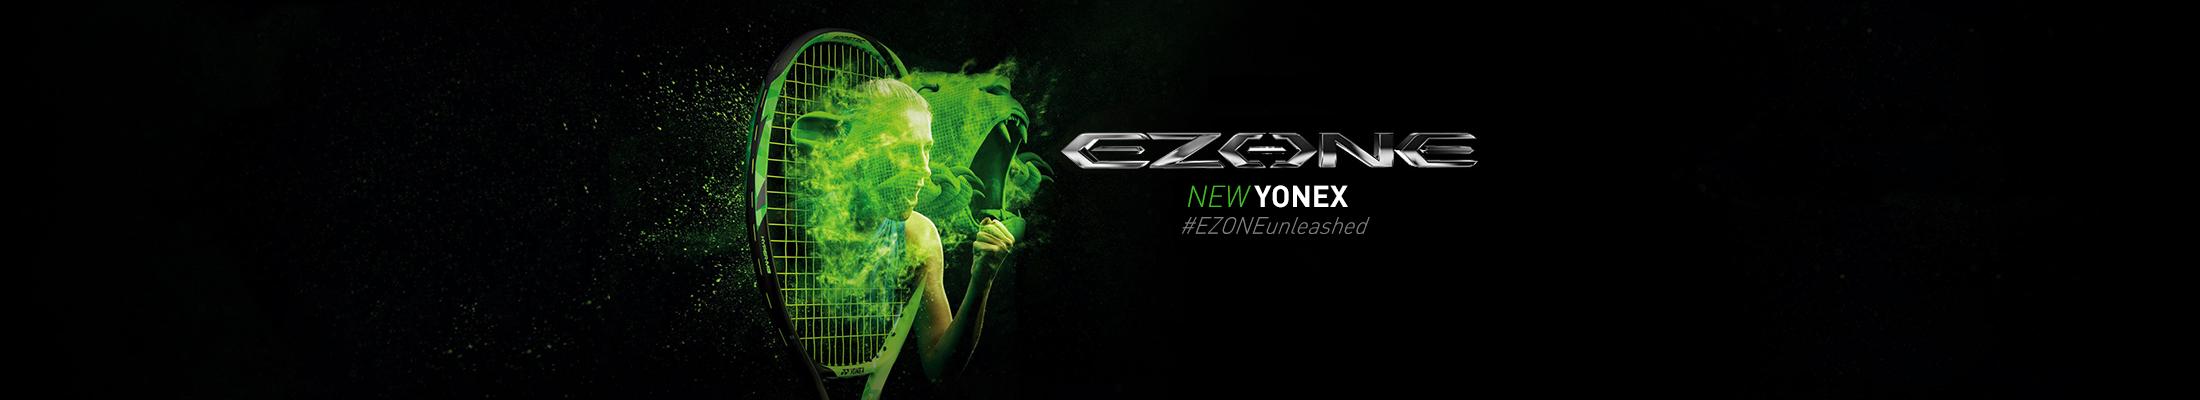 Tennis Rackets Yonex Ezone